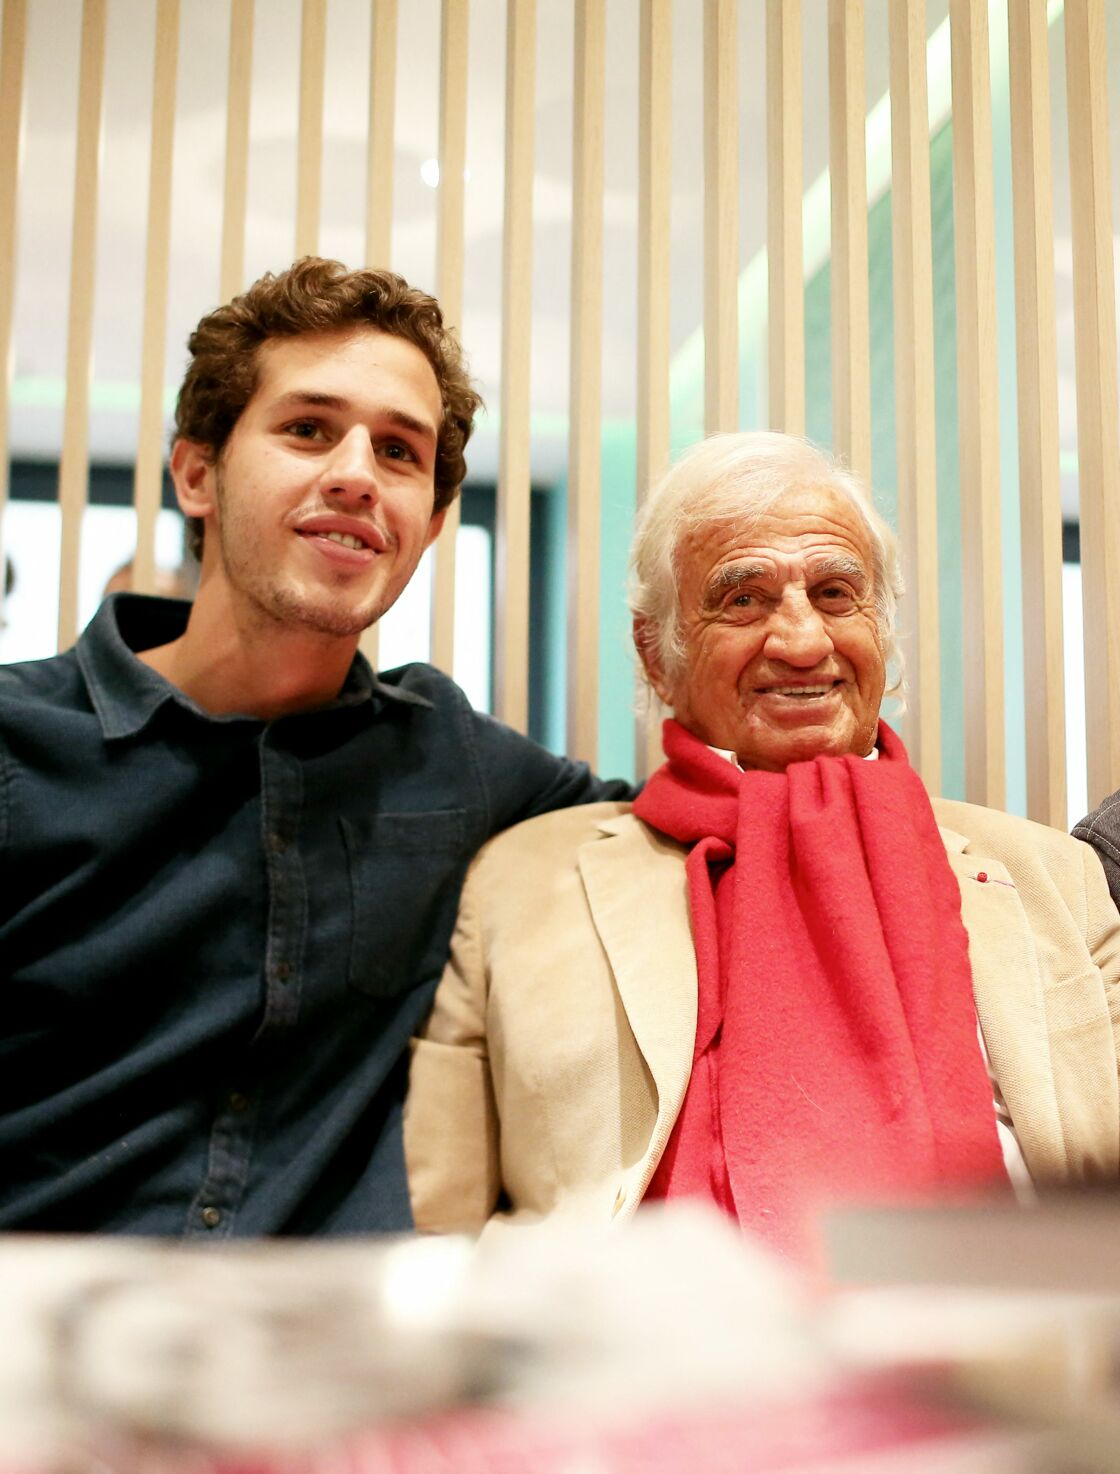 Victor, très proche de son grand-père Jean-Paul Belmondo